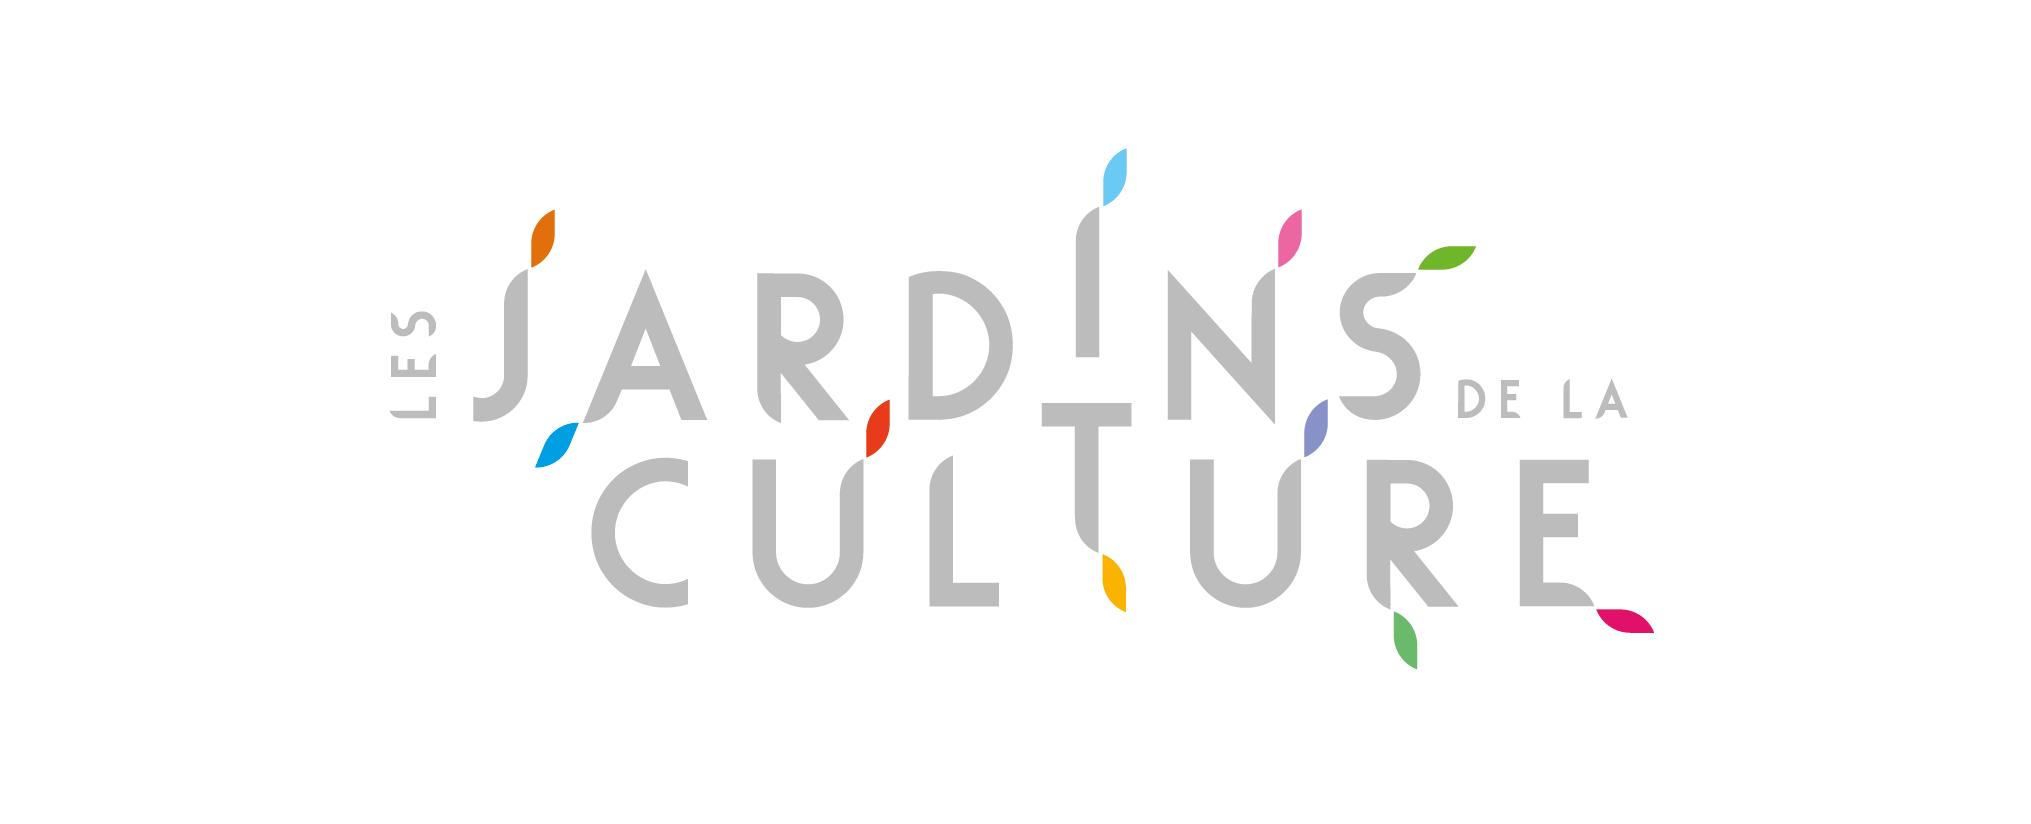 Accueil les jardins de la culture for Culture des jardins